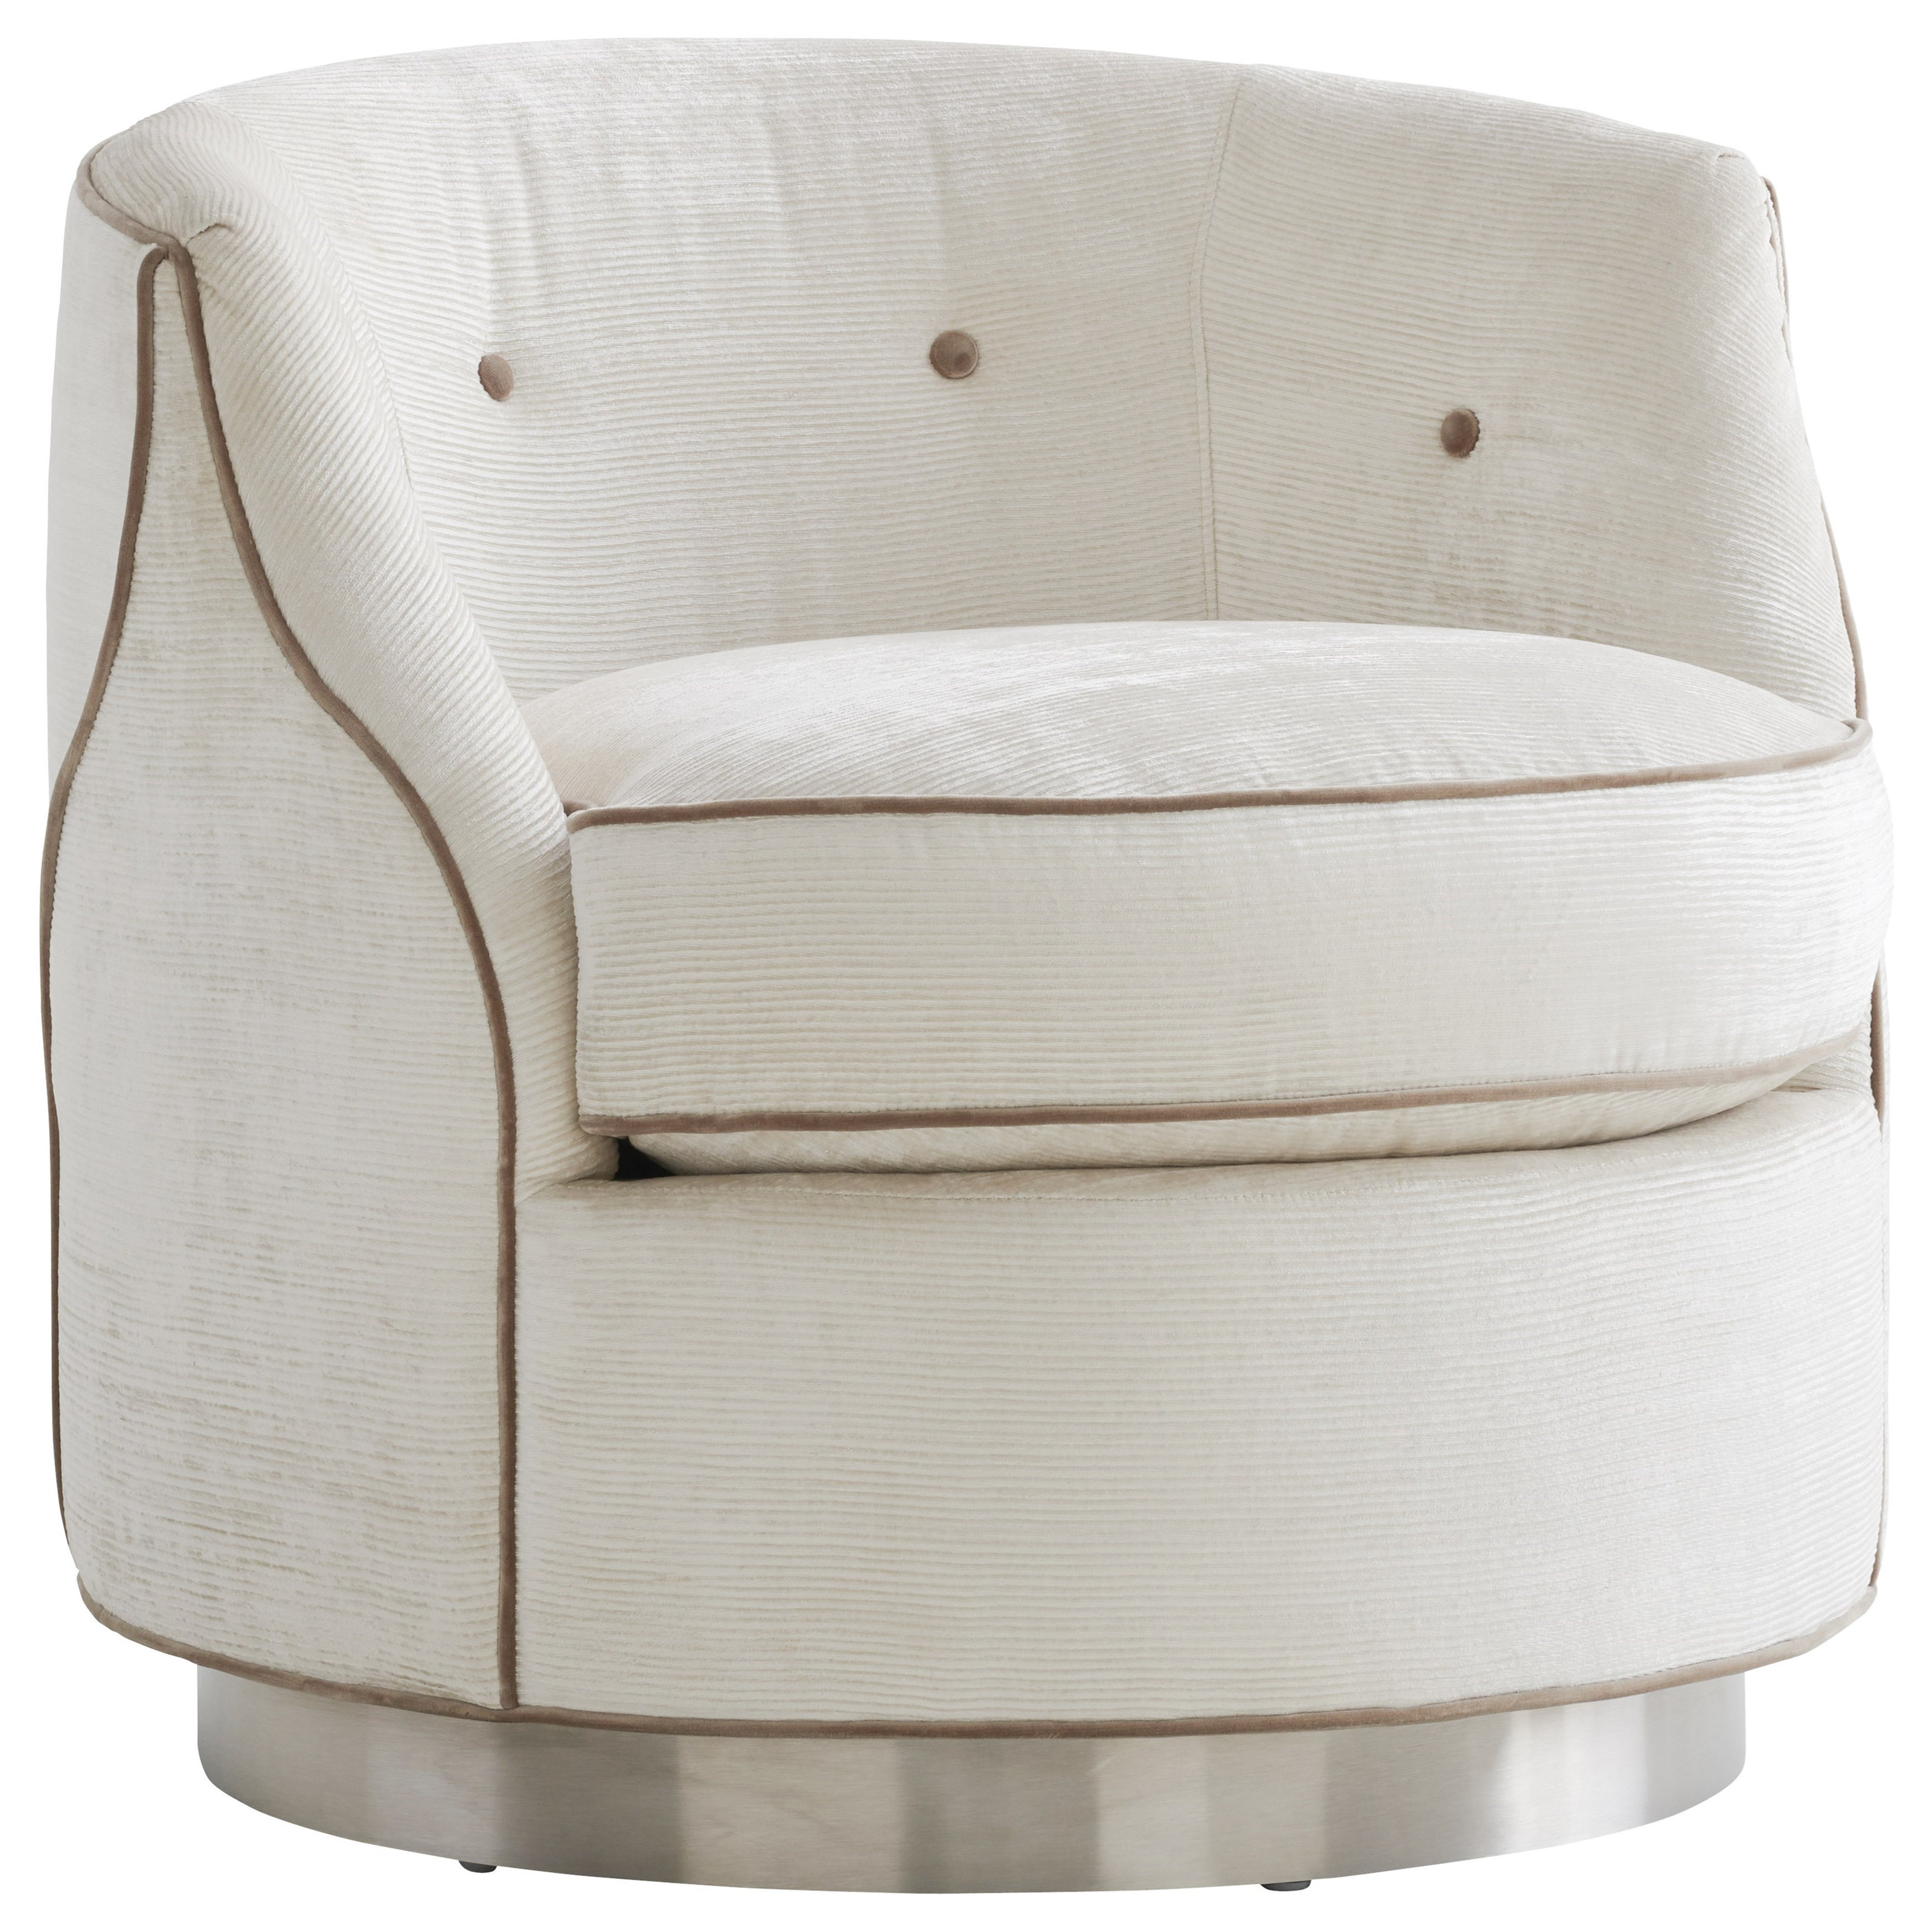 Avondale Robertson Swivel Chair by Lexington at Johnny Janosik